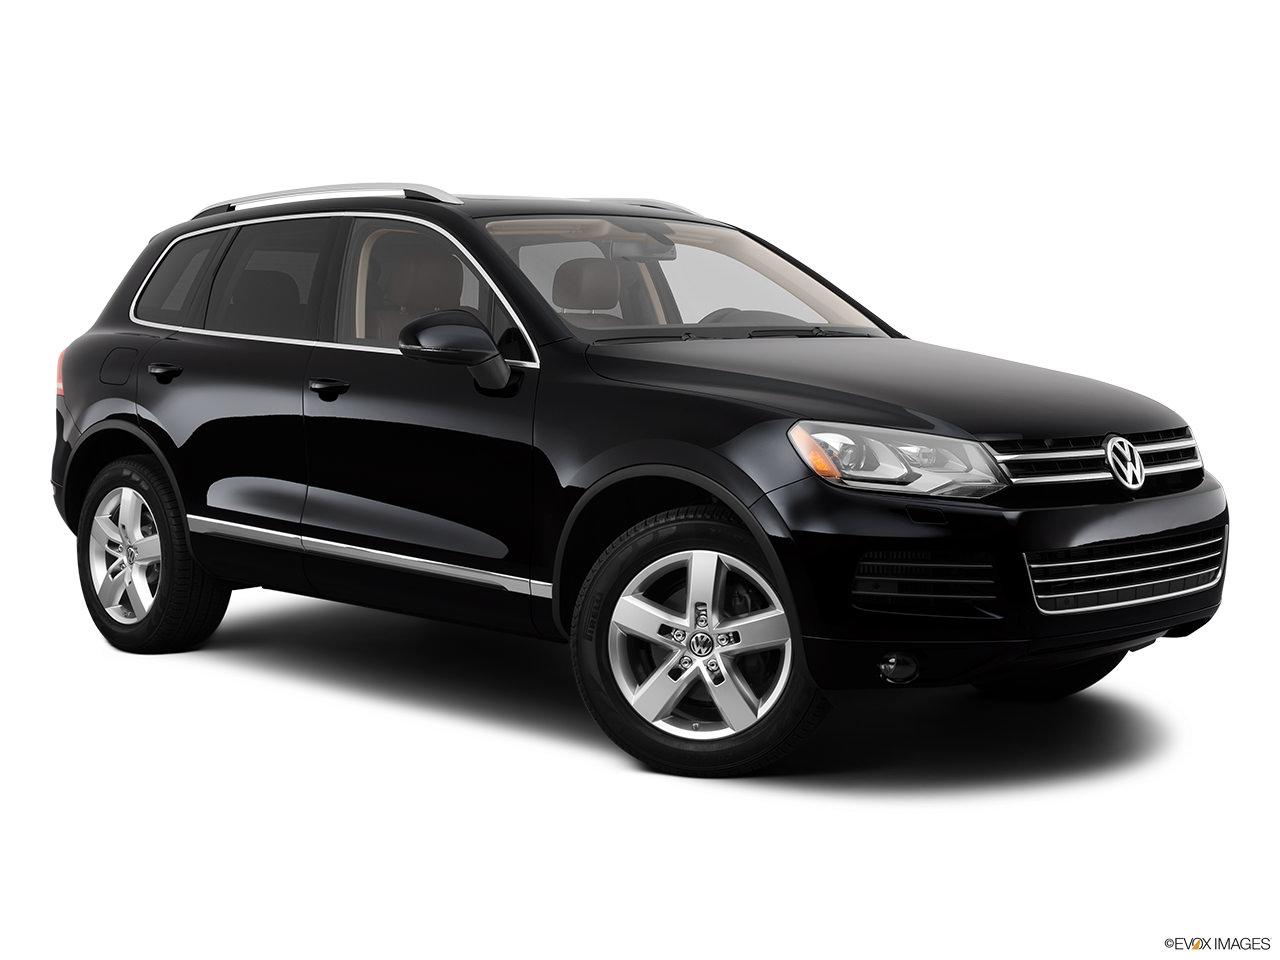 Volkswagen Touareg TDI 2012